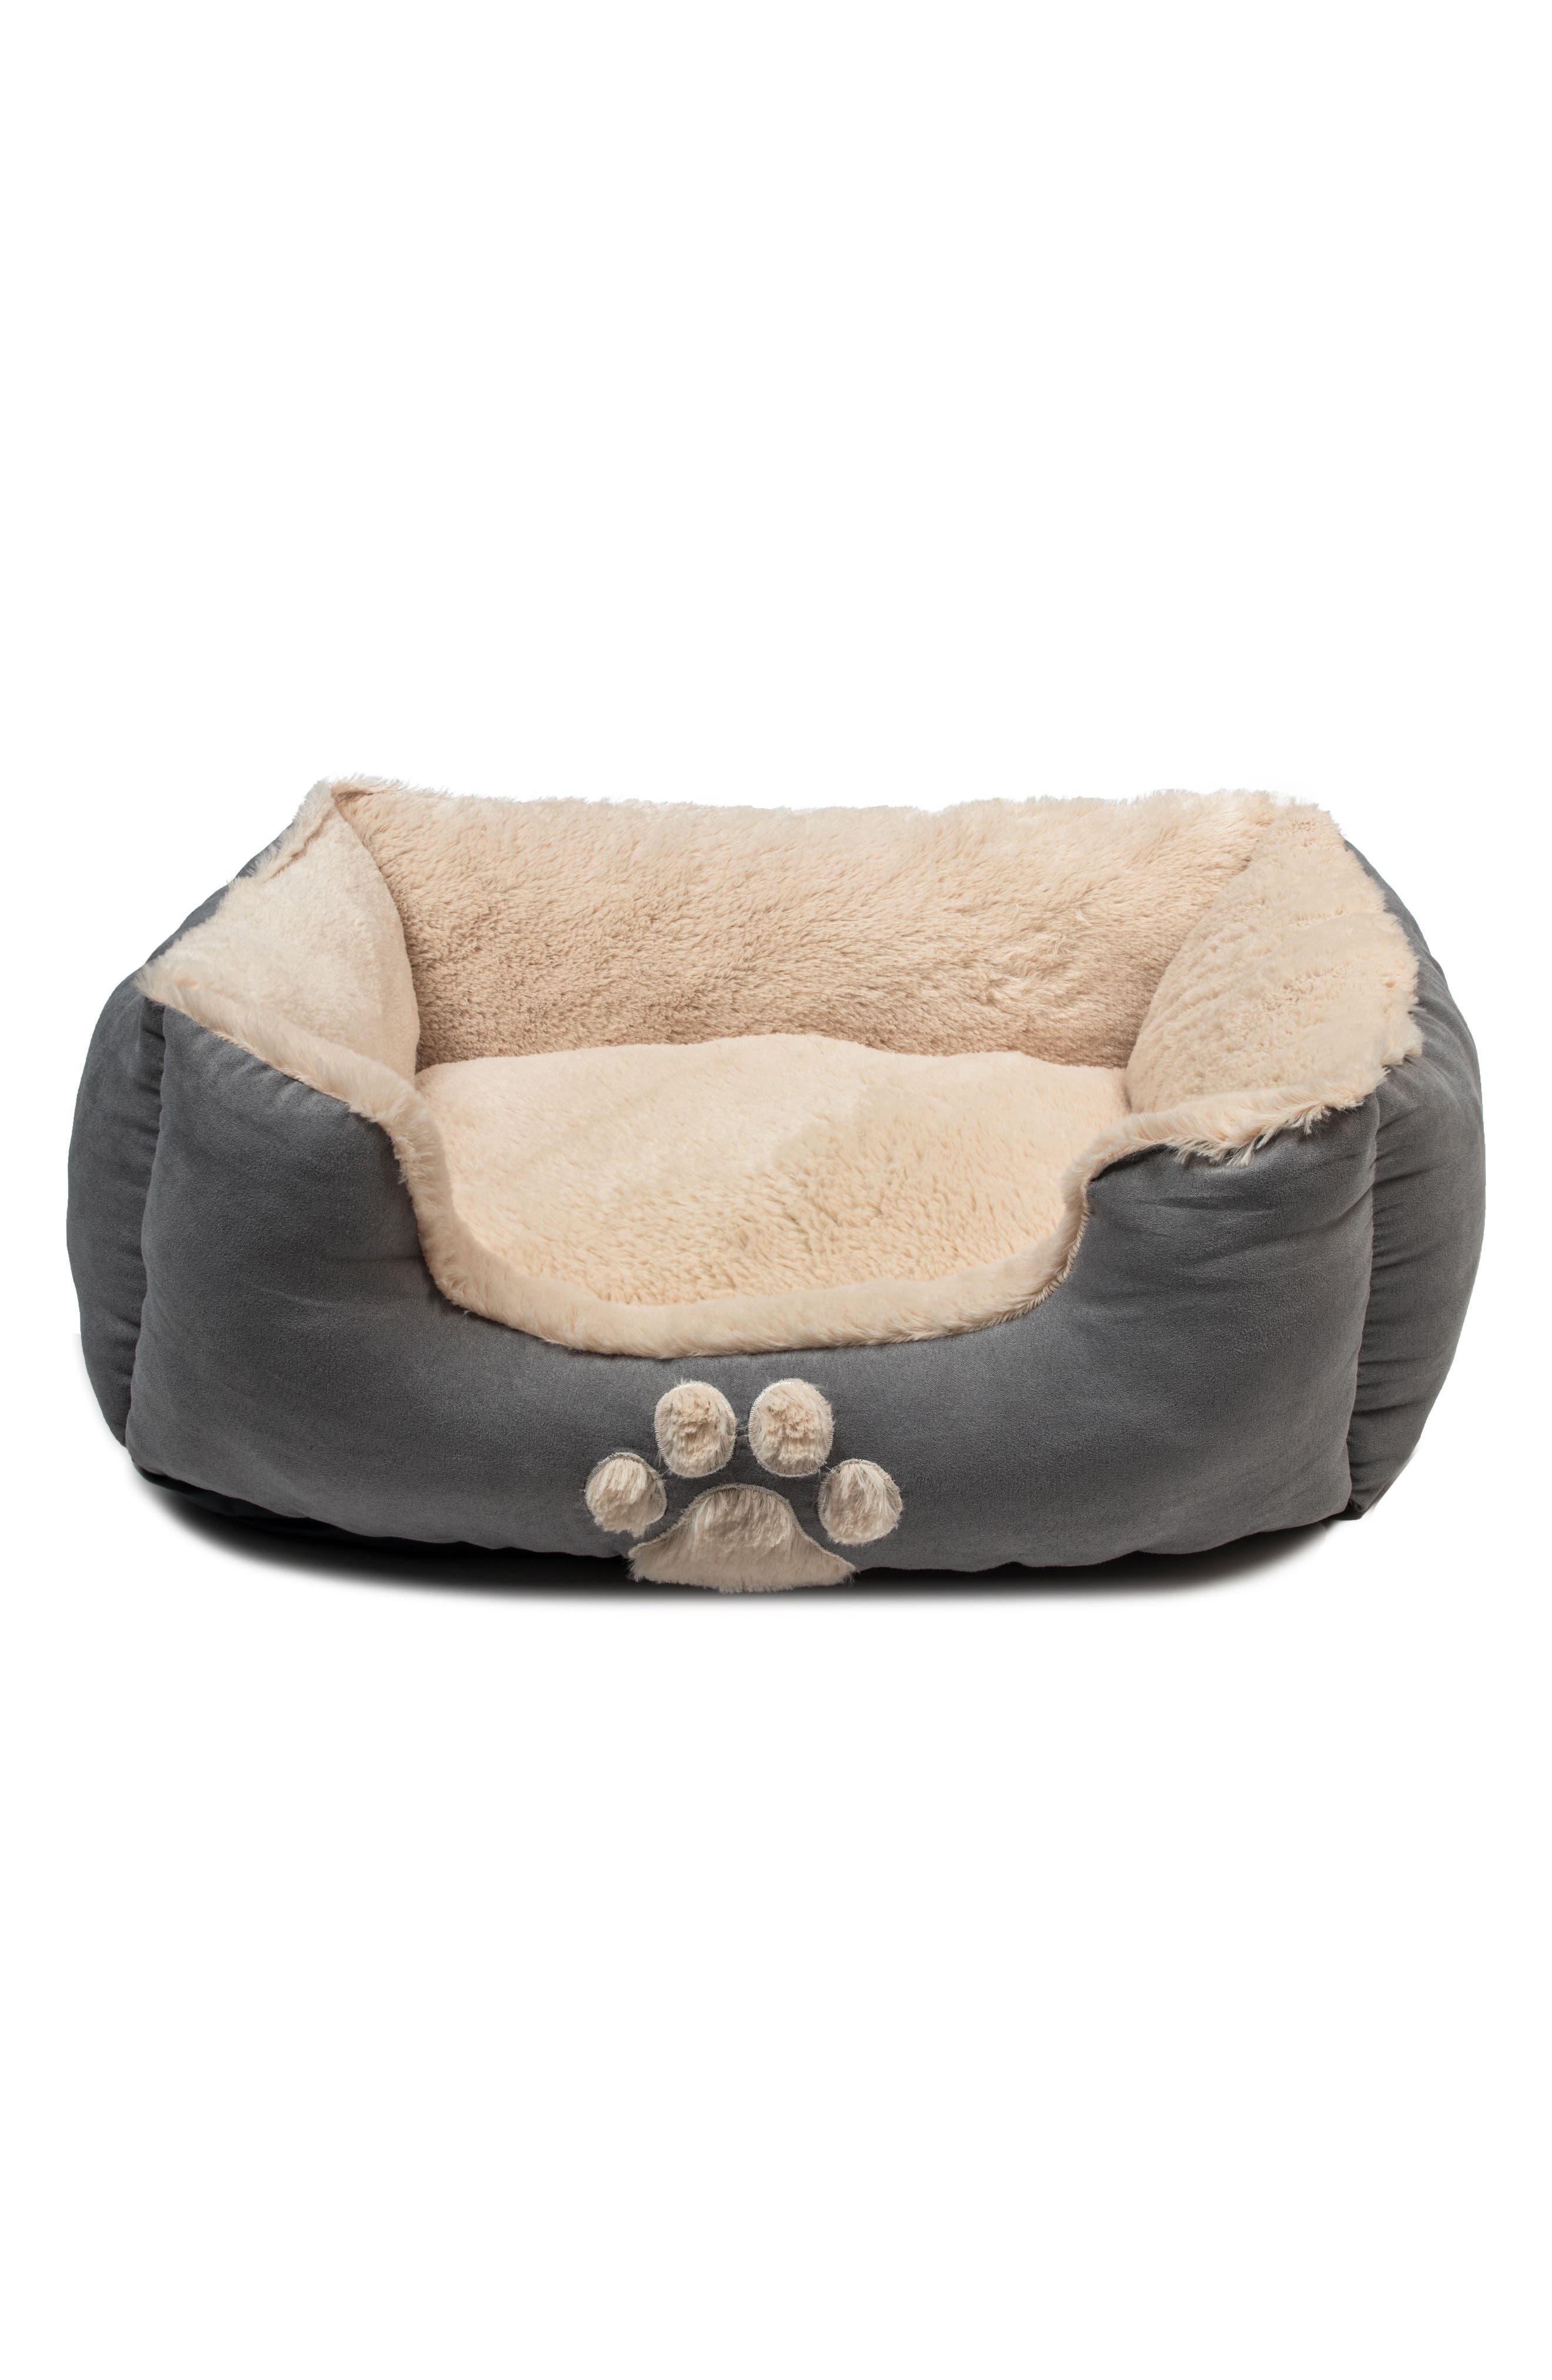 Roxi Square Pet Bed,                         Main,                         color, SLATE BLUE